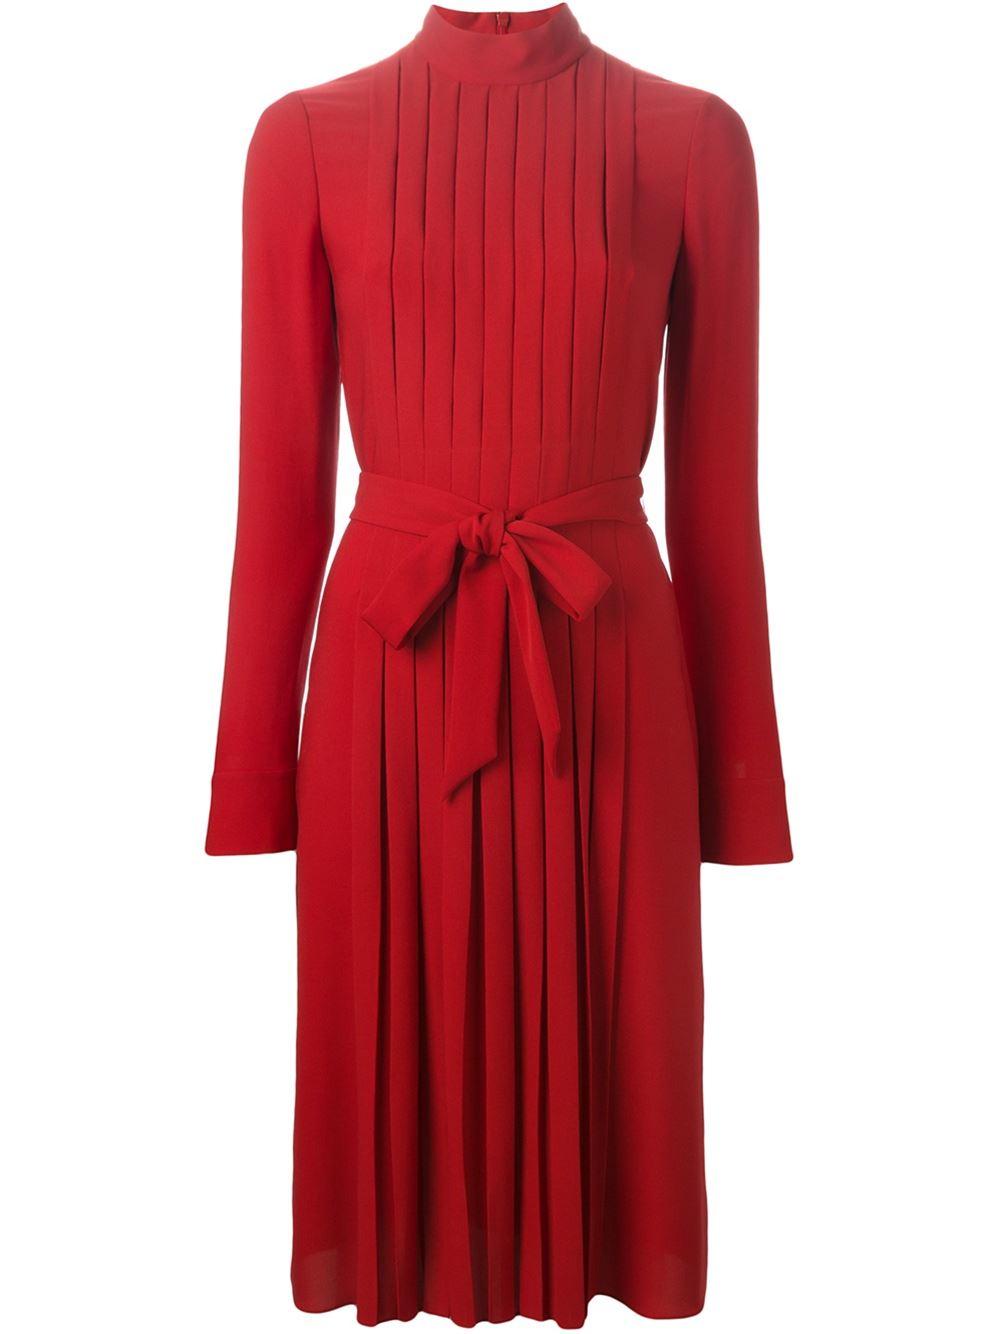 Ferragamo Pleated Dress in Red | Lyst